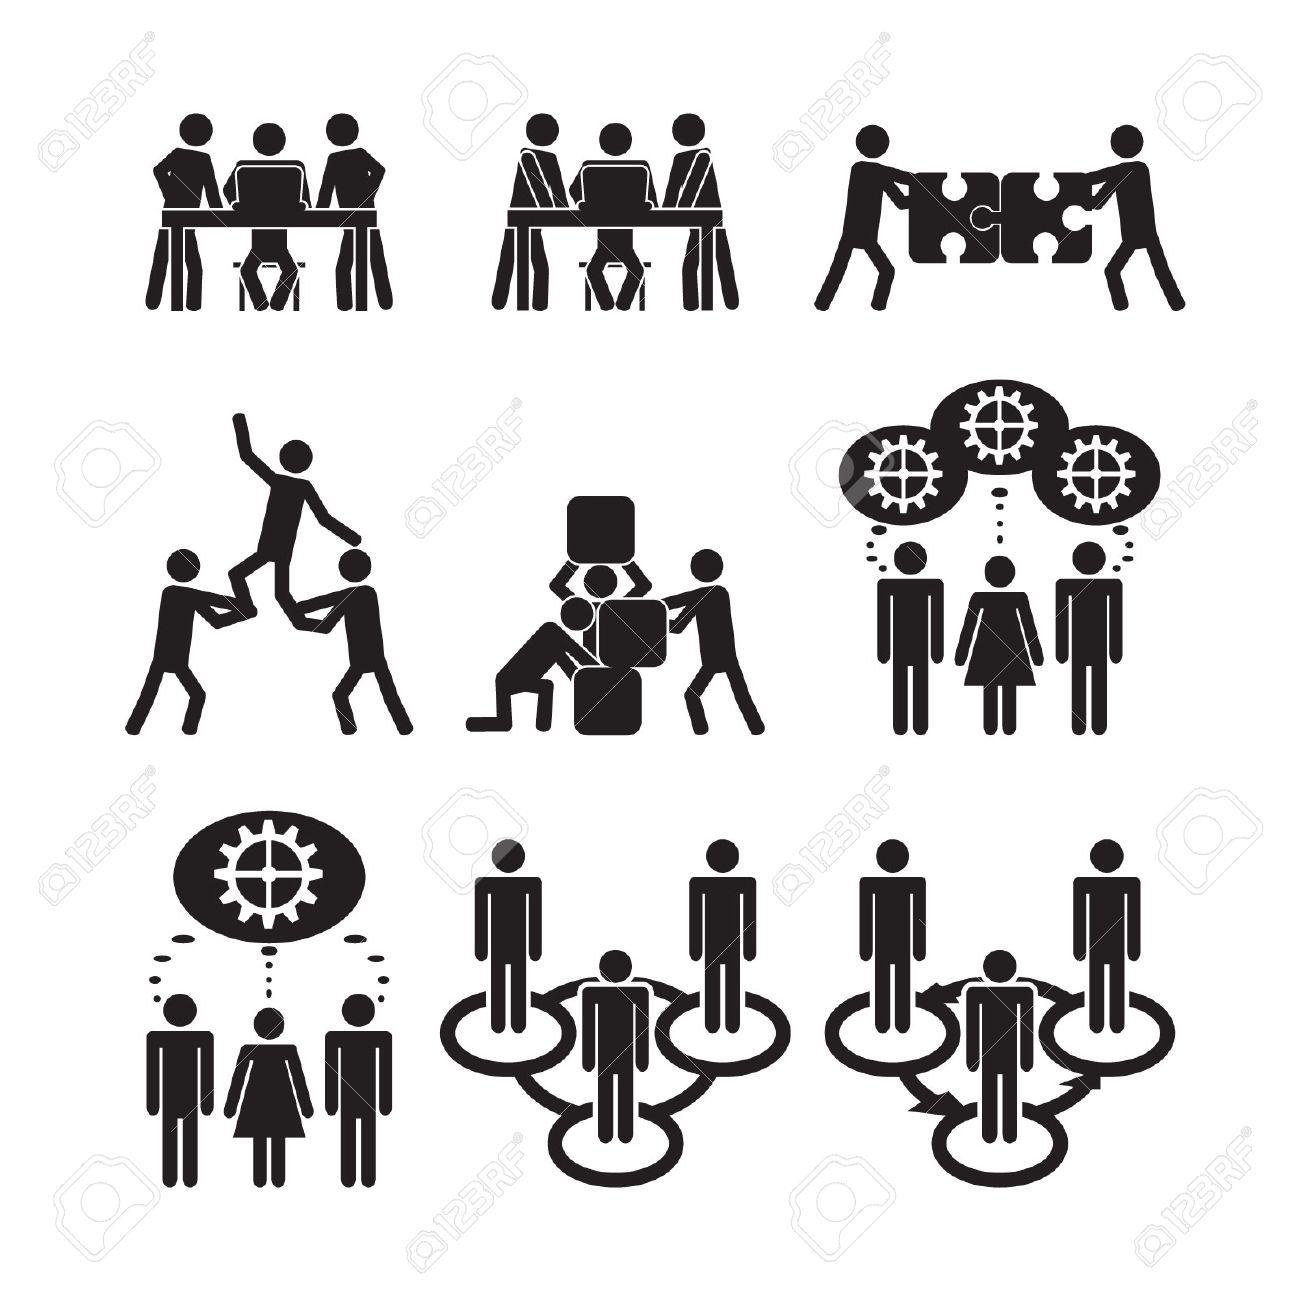 Teamwork icons set - 24703445